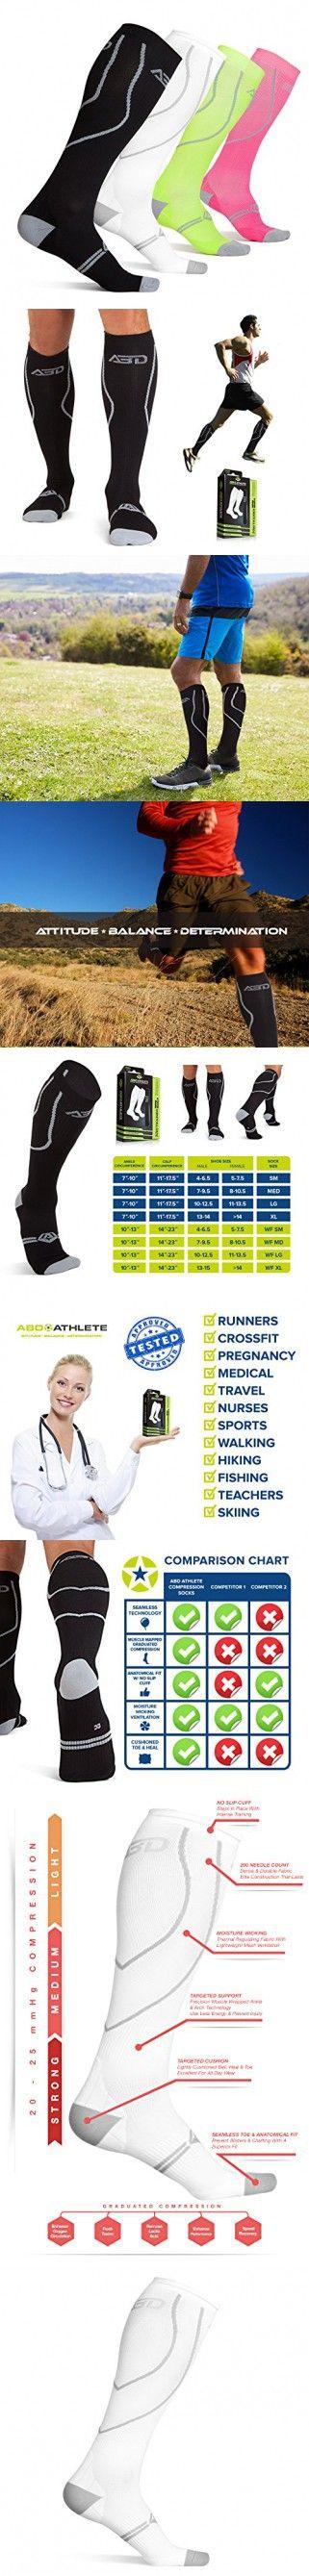 ABD ATHLETE Compression Socks, 20-25 mmHg, Medium - White